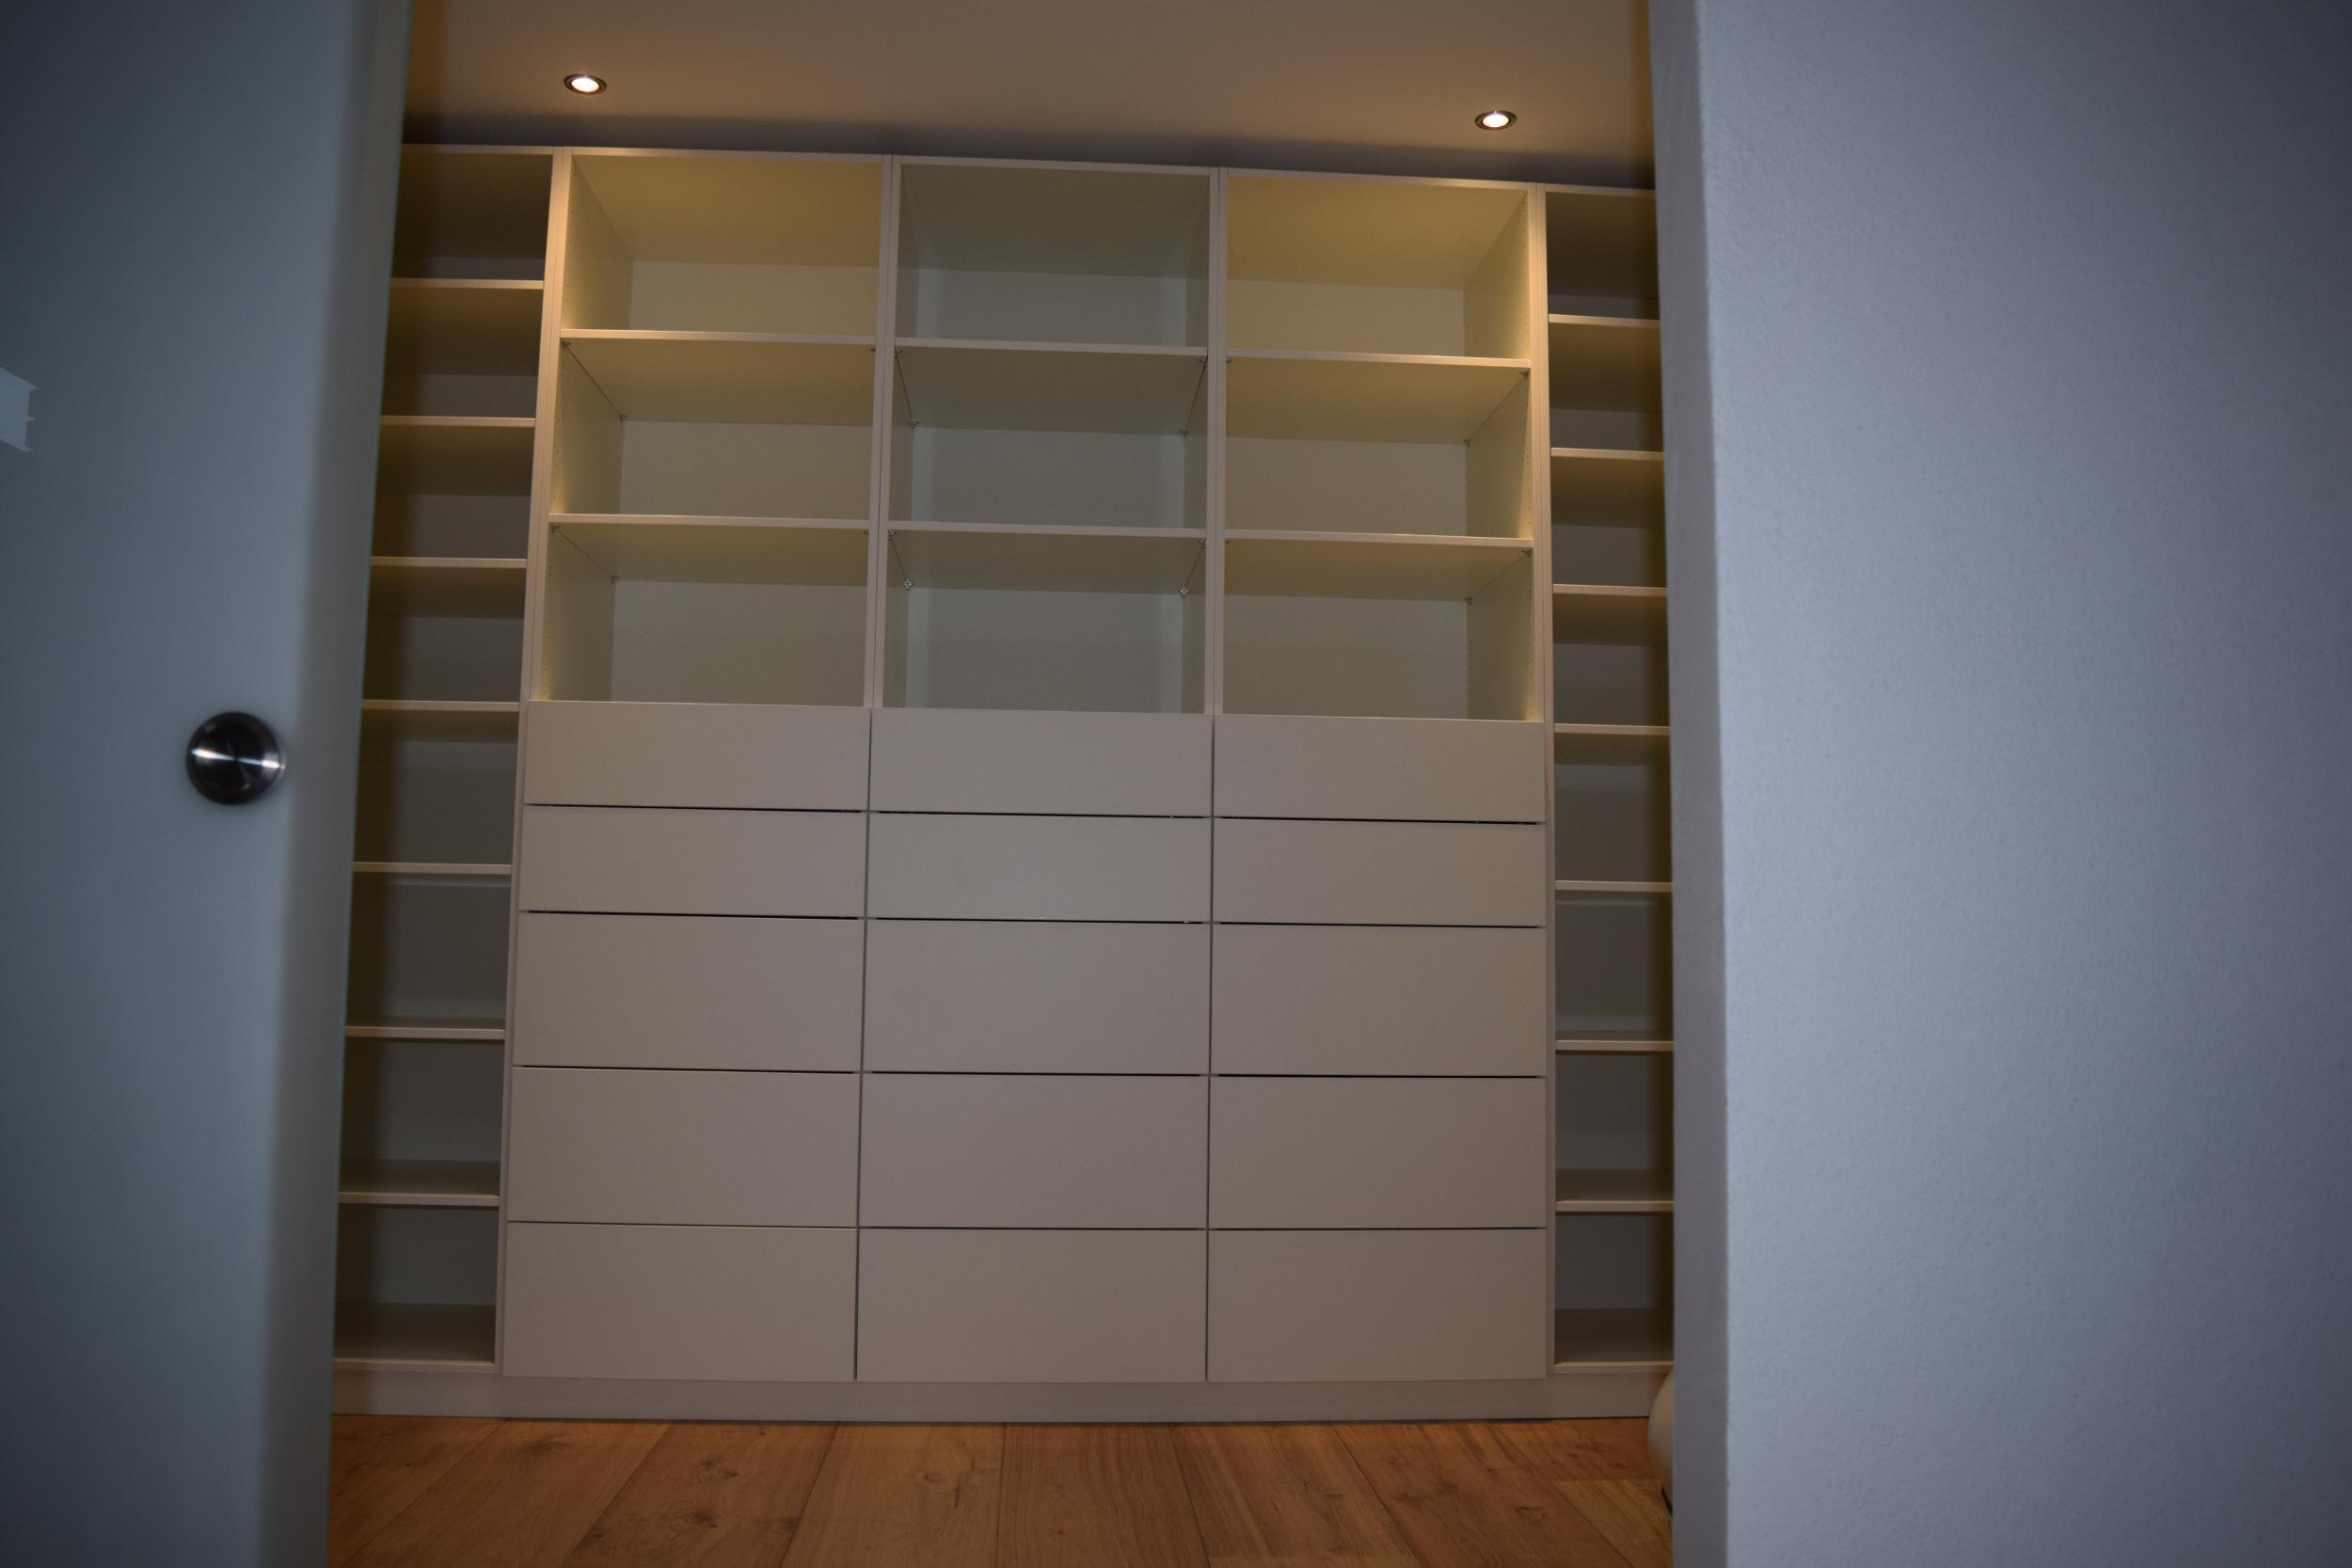 ankleidezimmer mit garderobenlift fuisting tischlerei soest. Black Bedroom Furniture Sets. Home Design Ideas